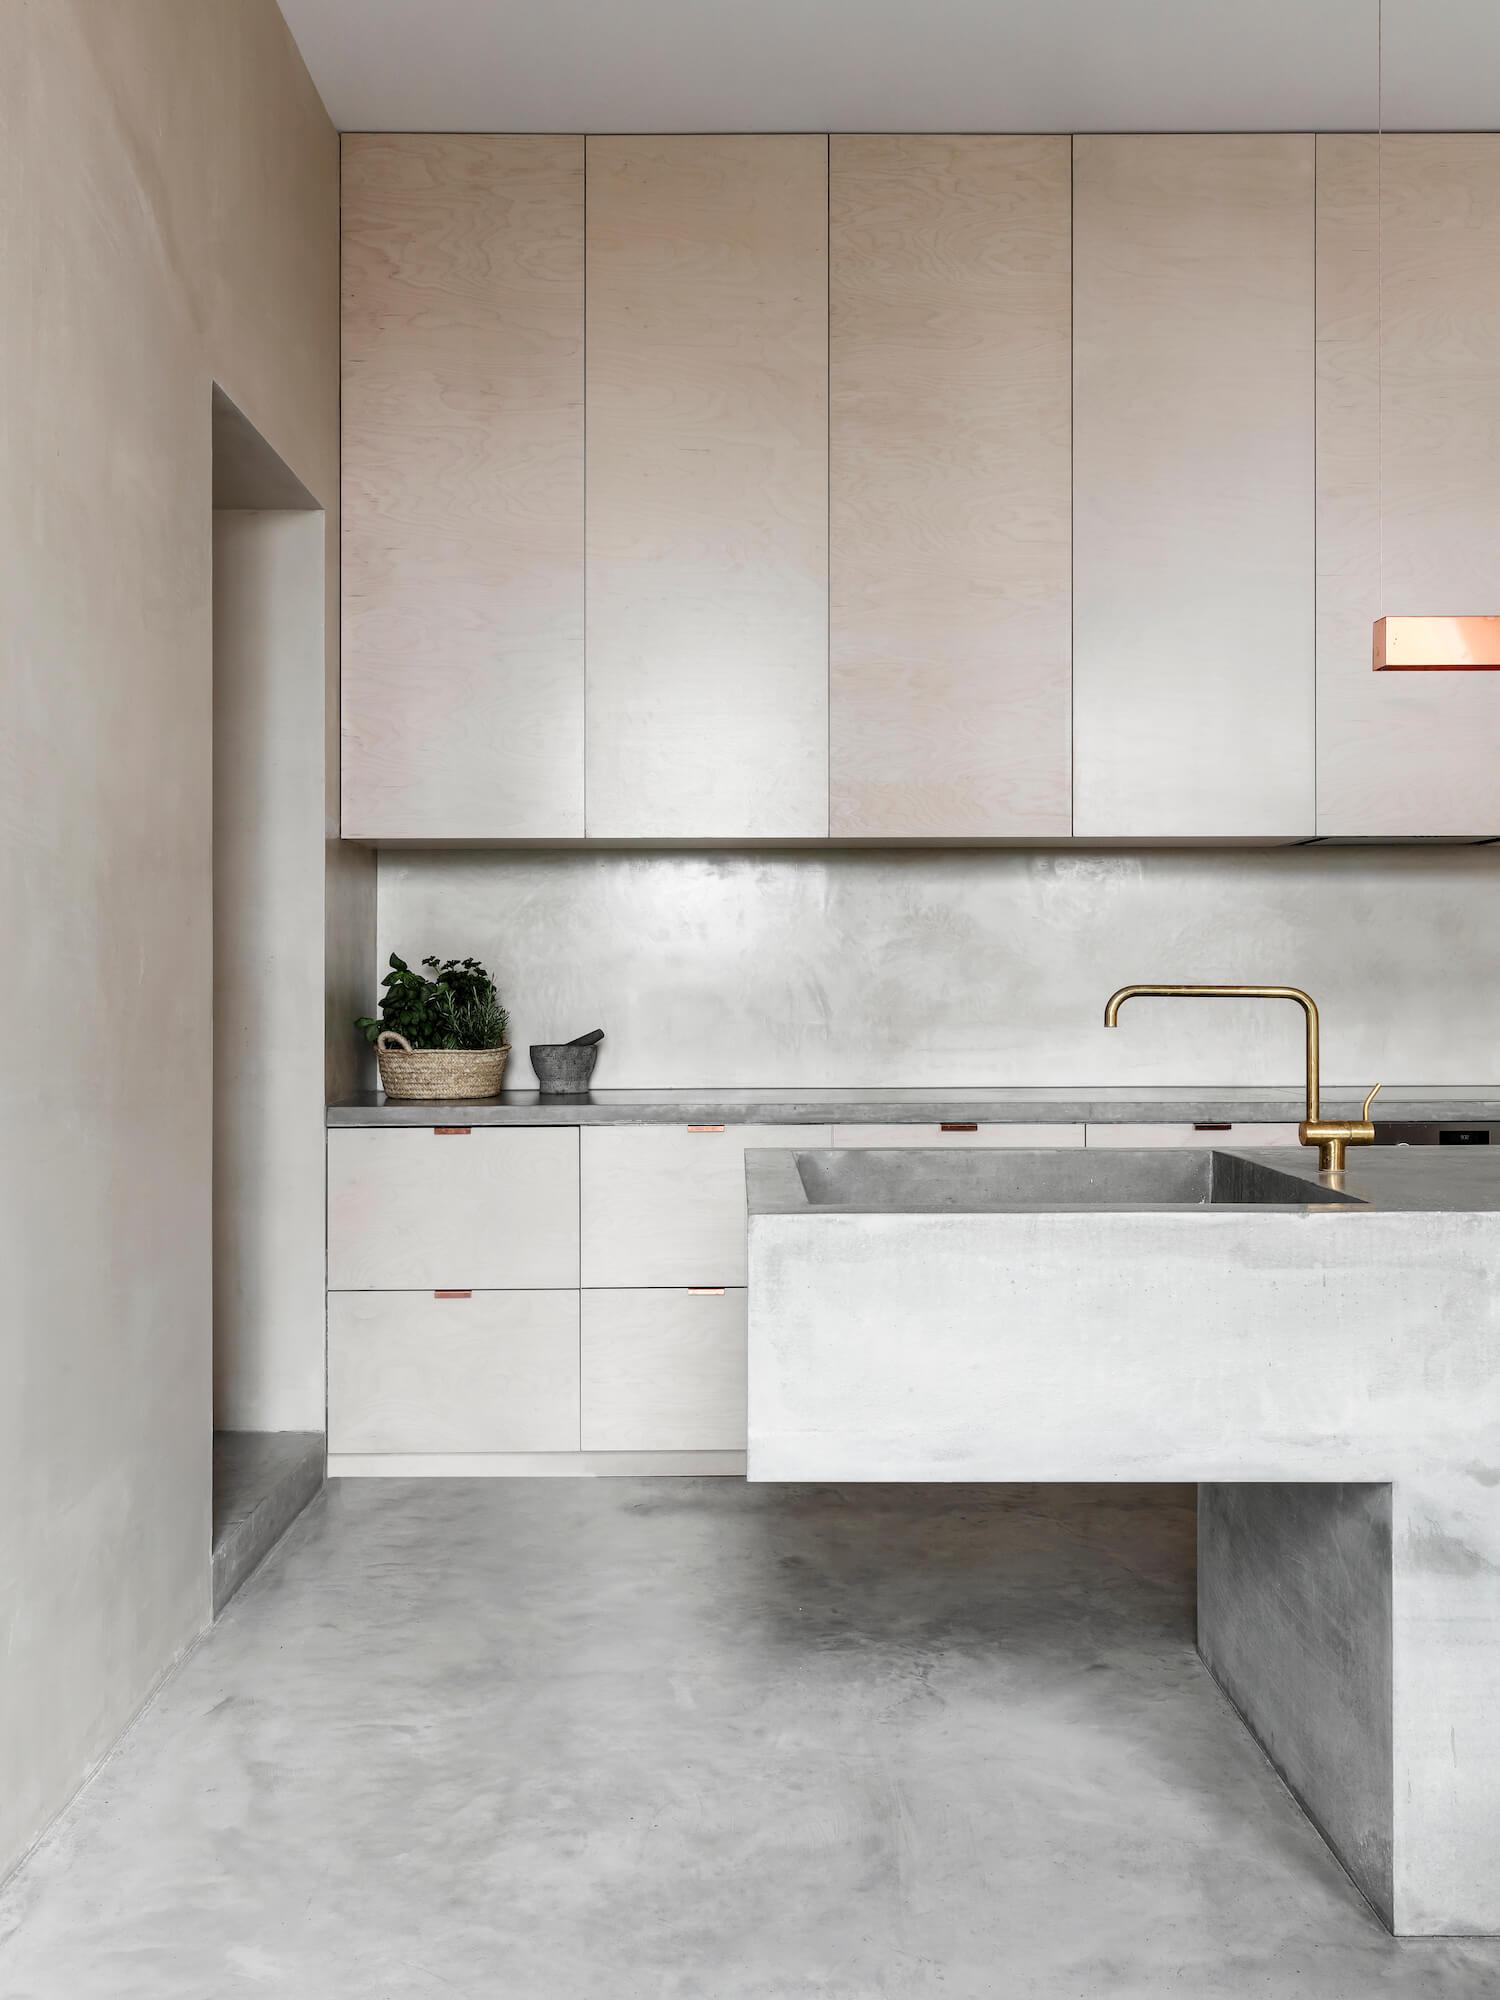 est-living-interiors-mar-plus-ask-glogauer-strasse-15.jpg